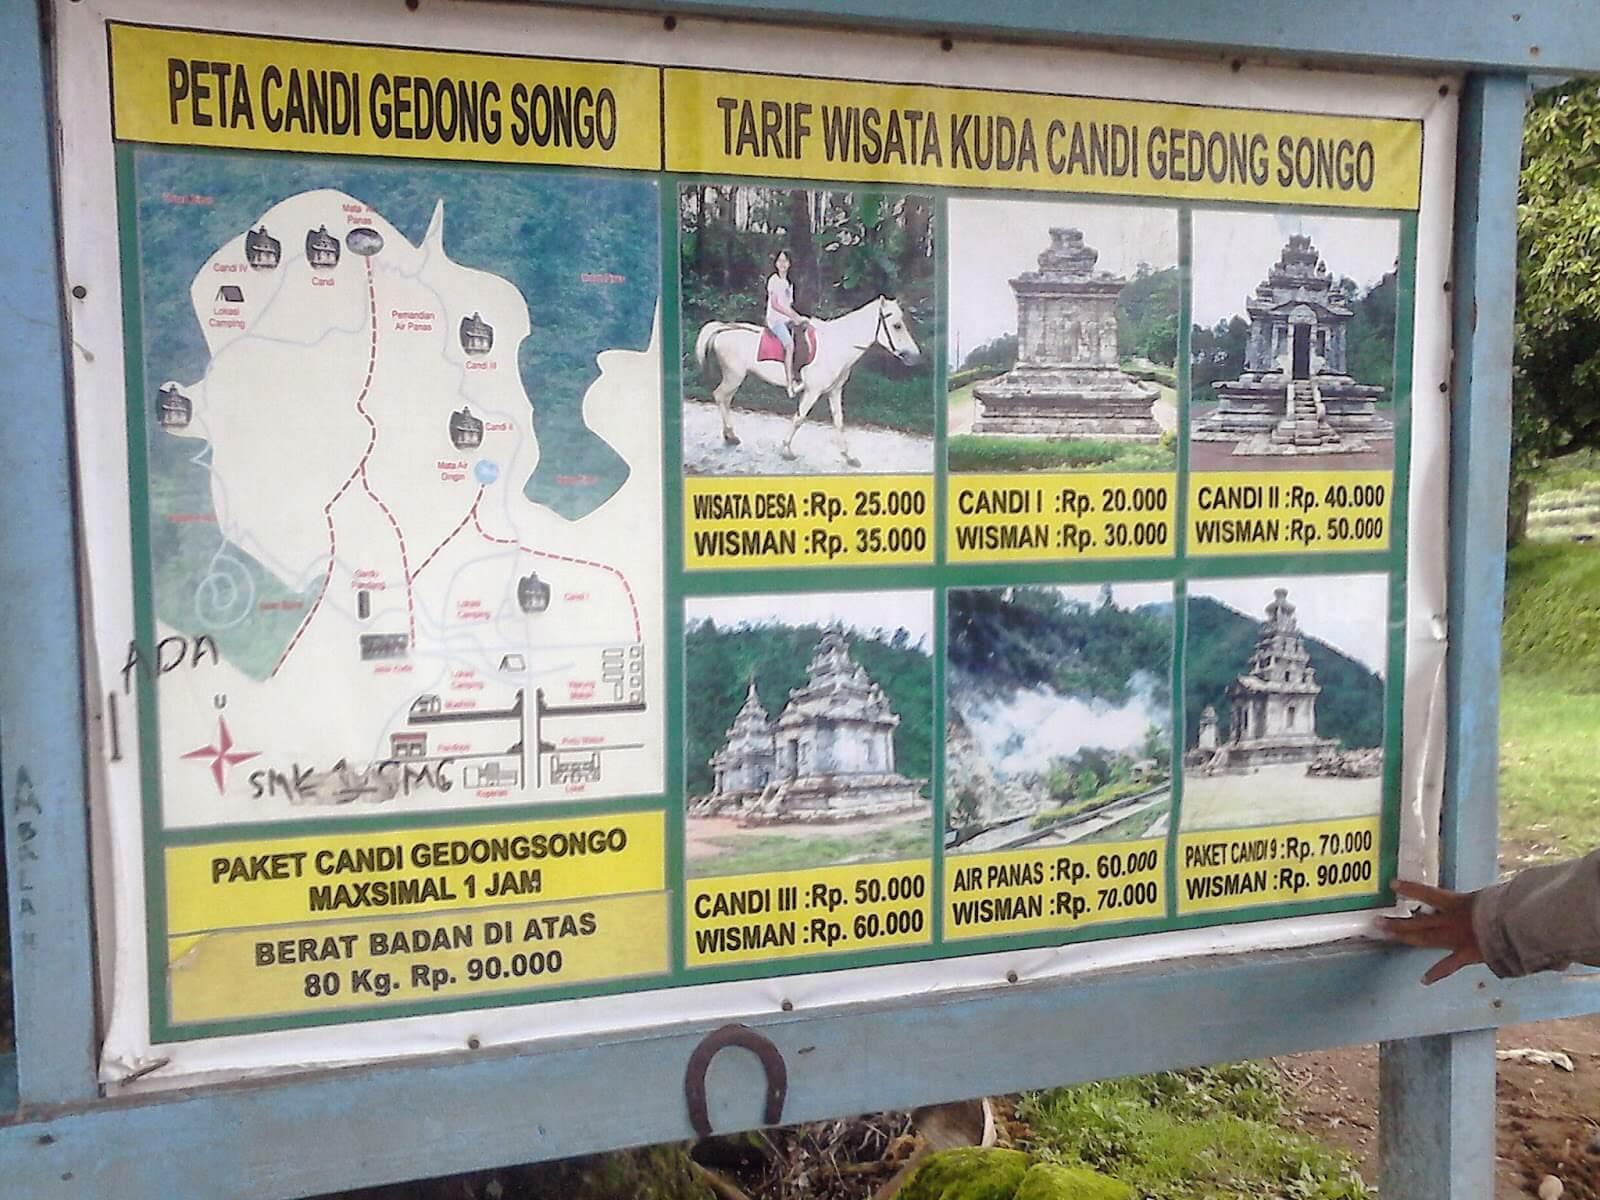 Candi Songo Semarang Tresnaasprillayahoocom Paket Wisata Kuda Gedong Kab